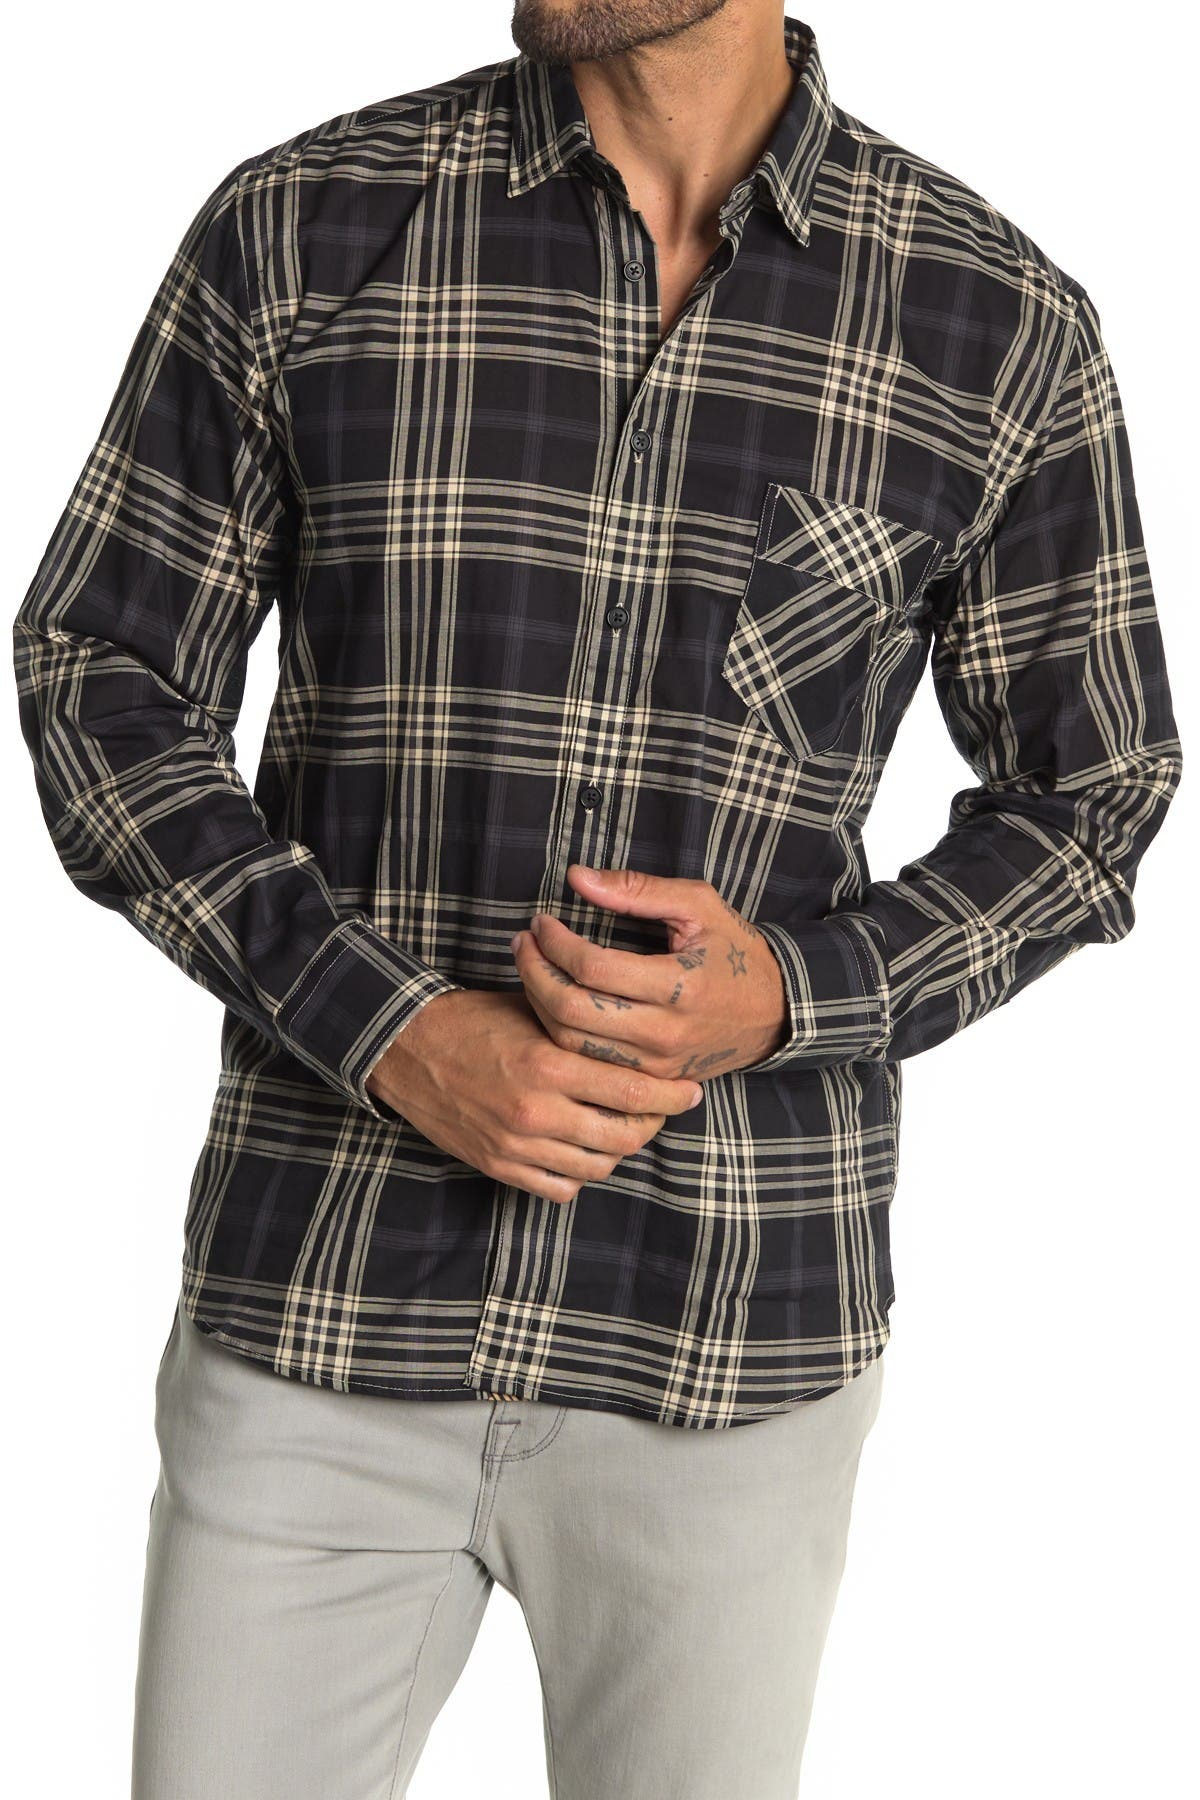 Image of Billy Reid John T Plaid Shirt